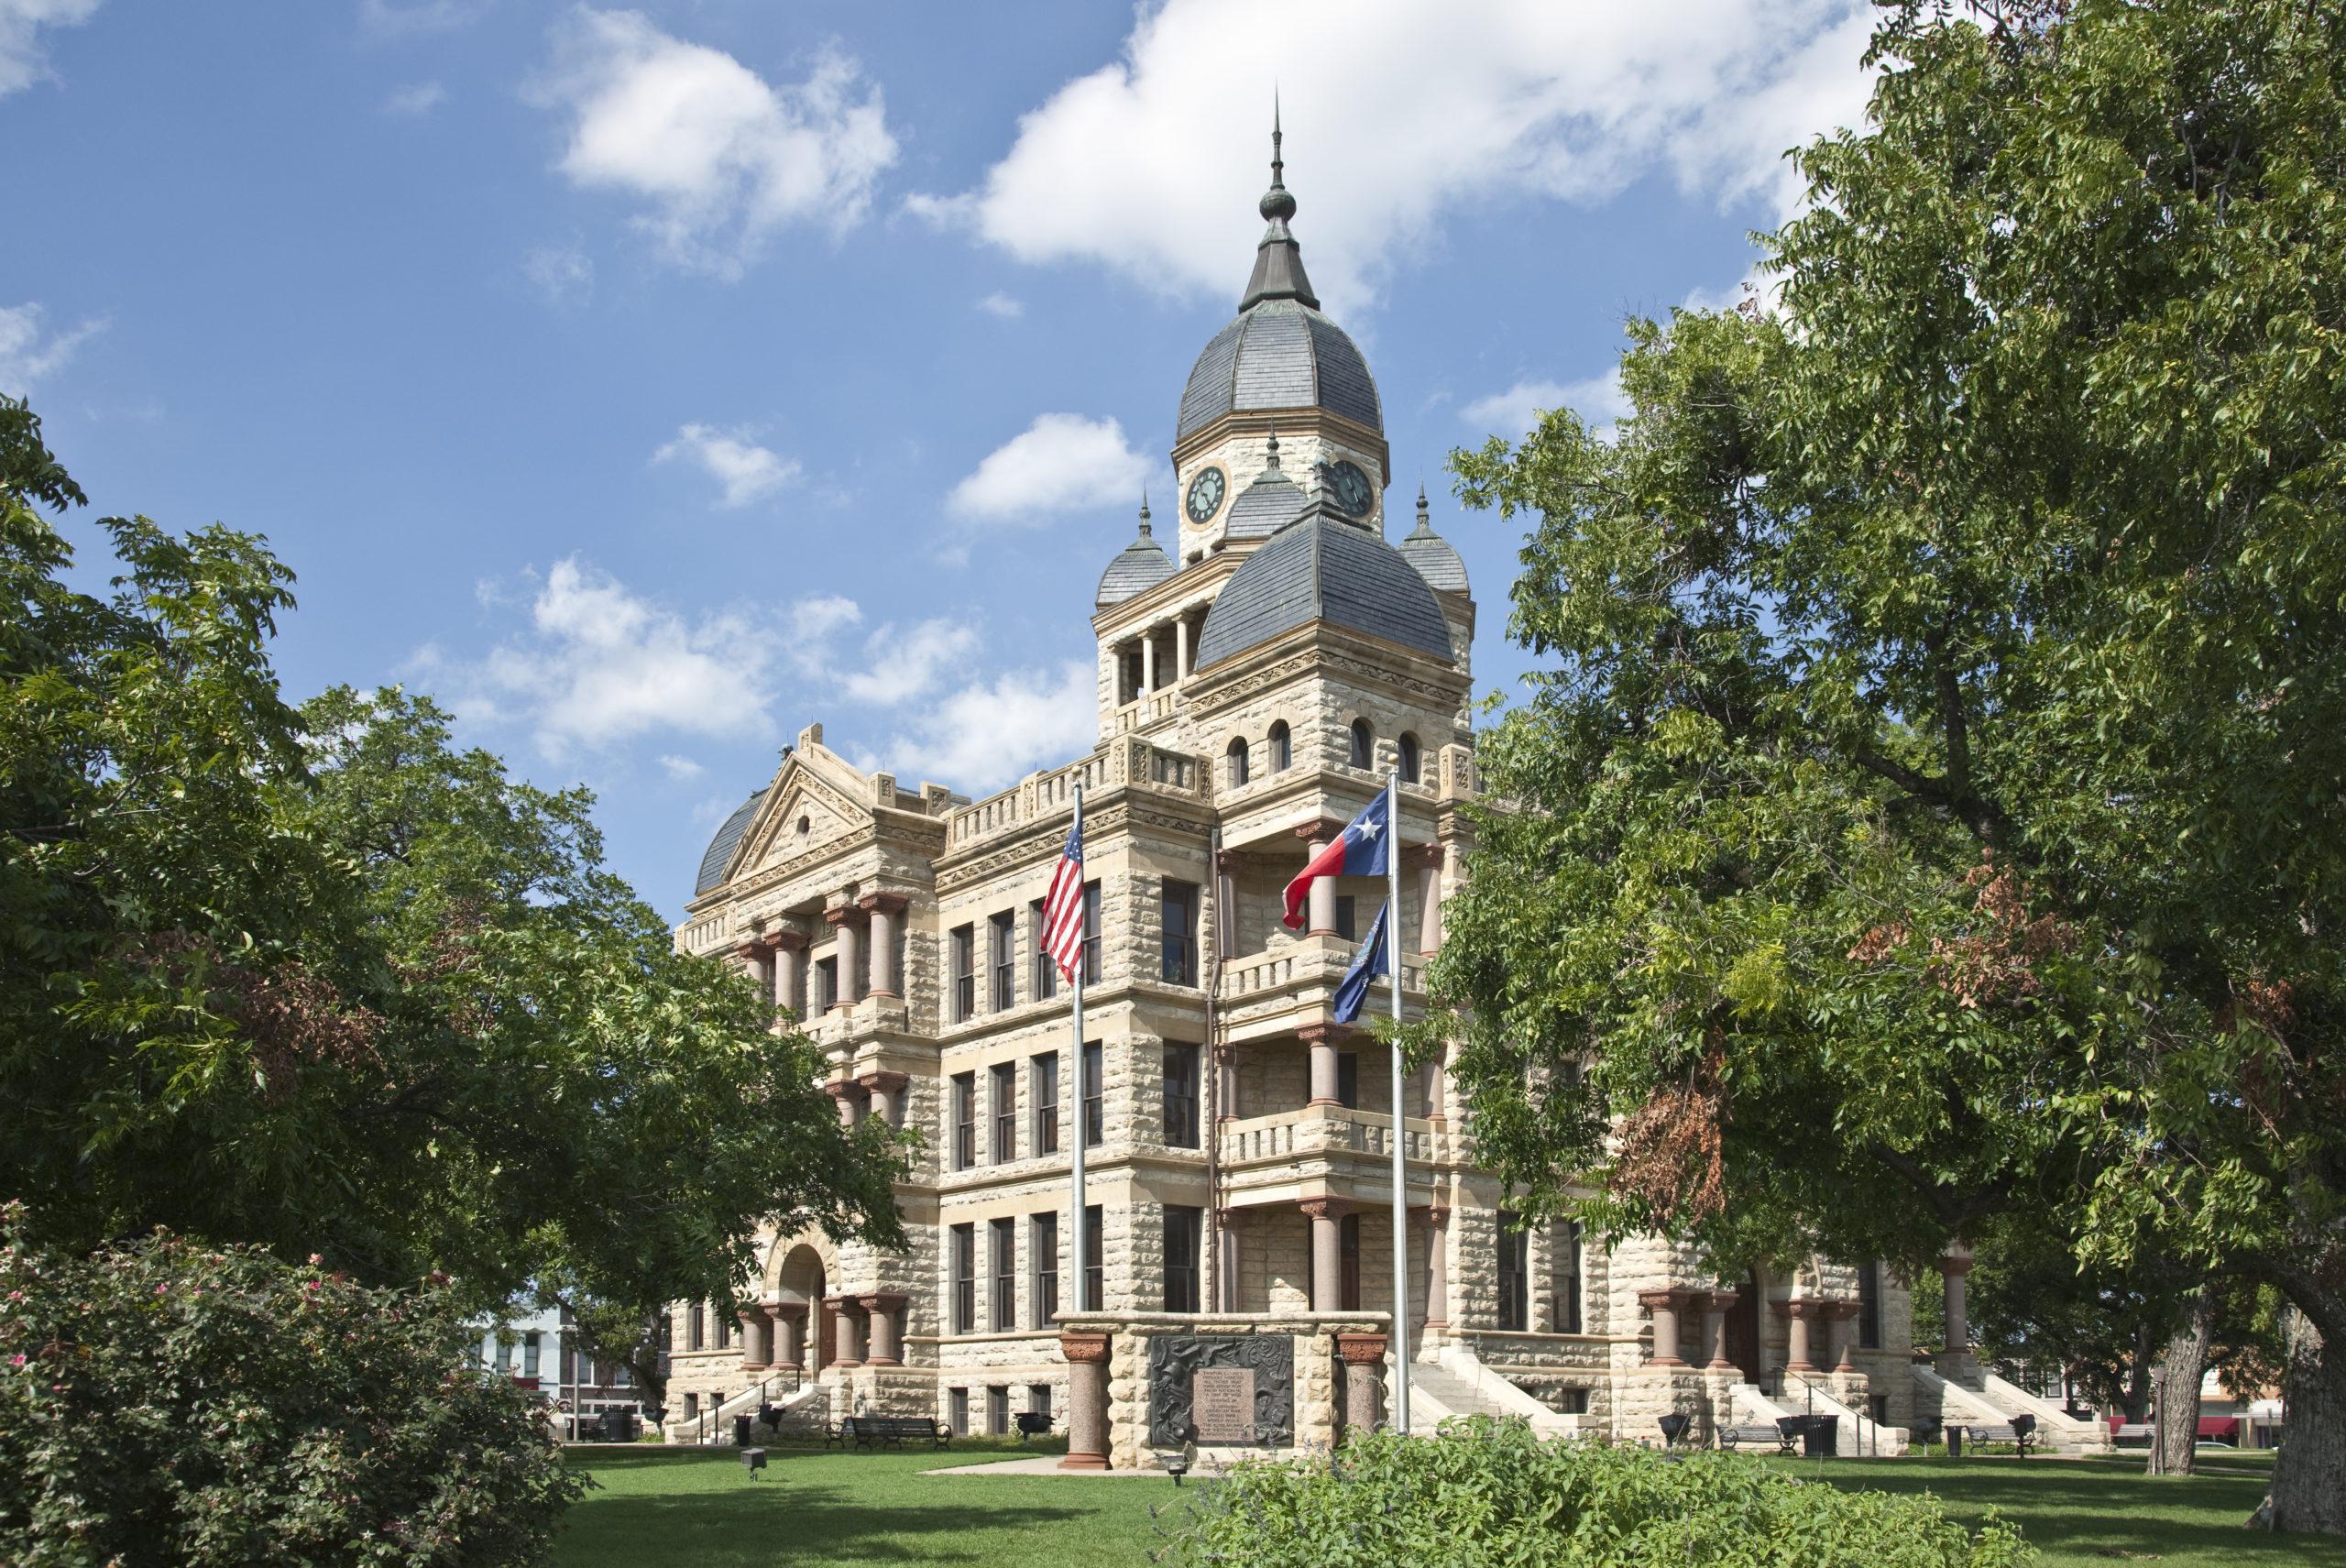 Unite Private Networks Announces Expansion into Denton, Texas